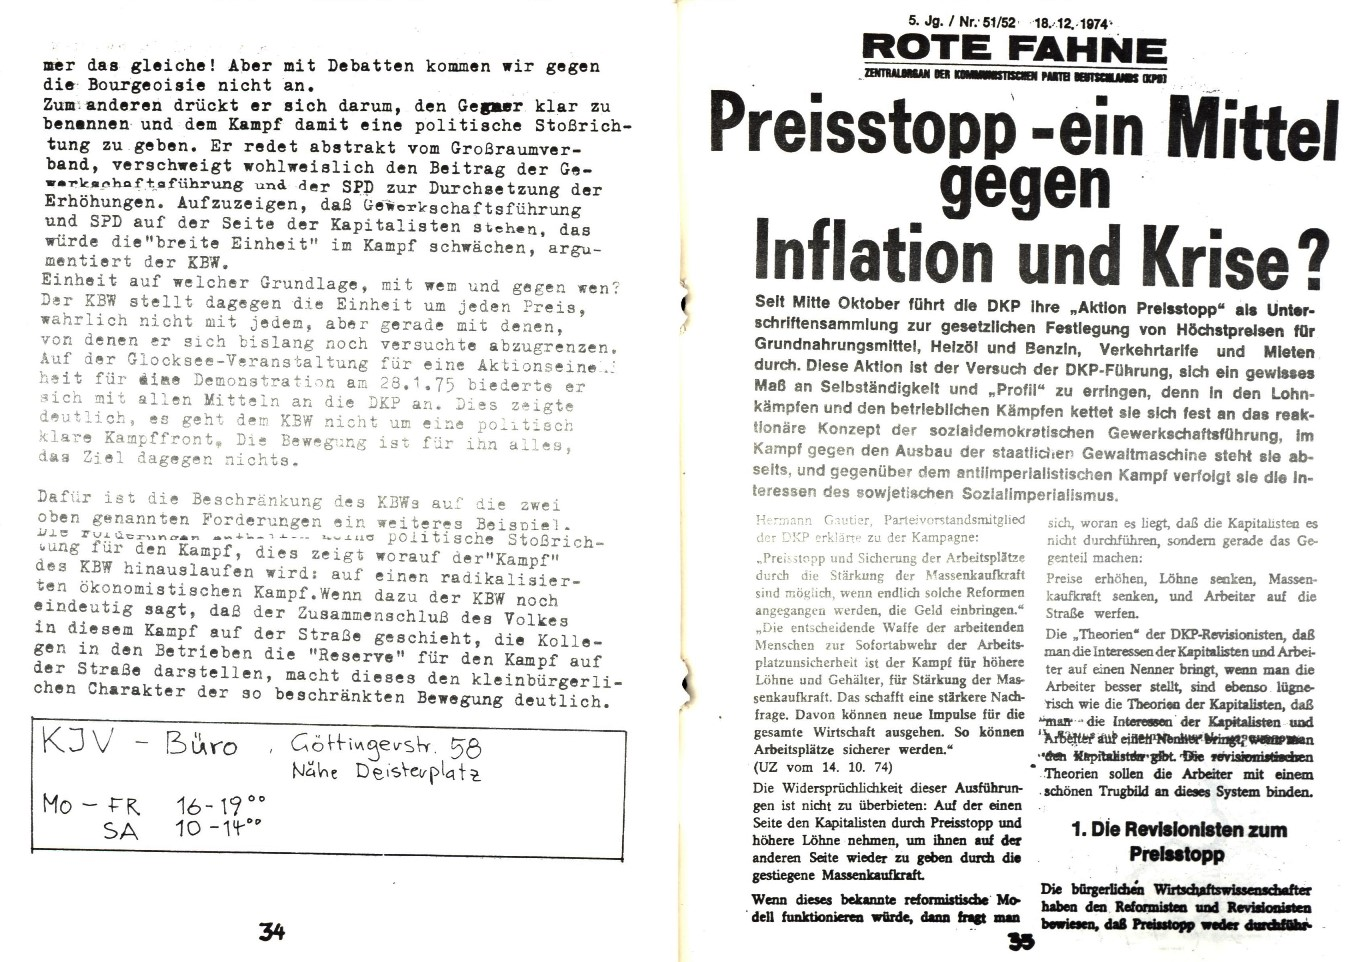 Hannover_AO_1975_Fahrpreisboykott_21